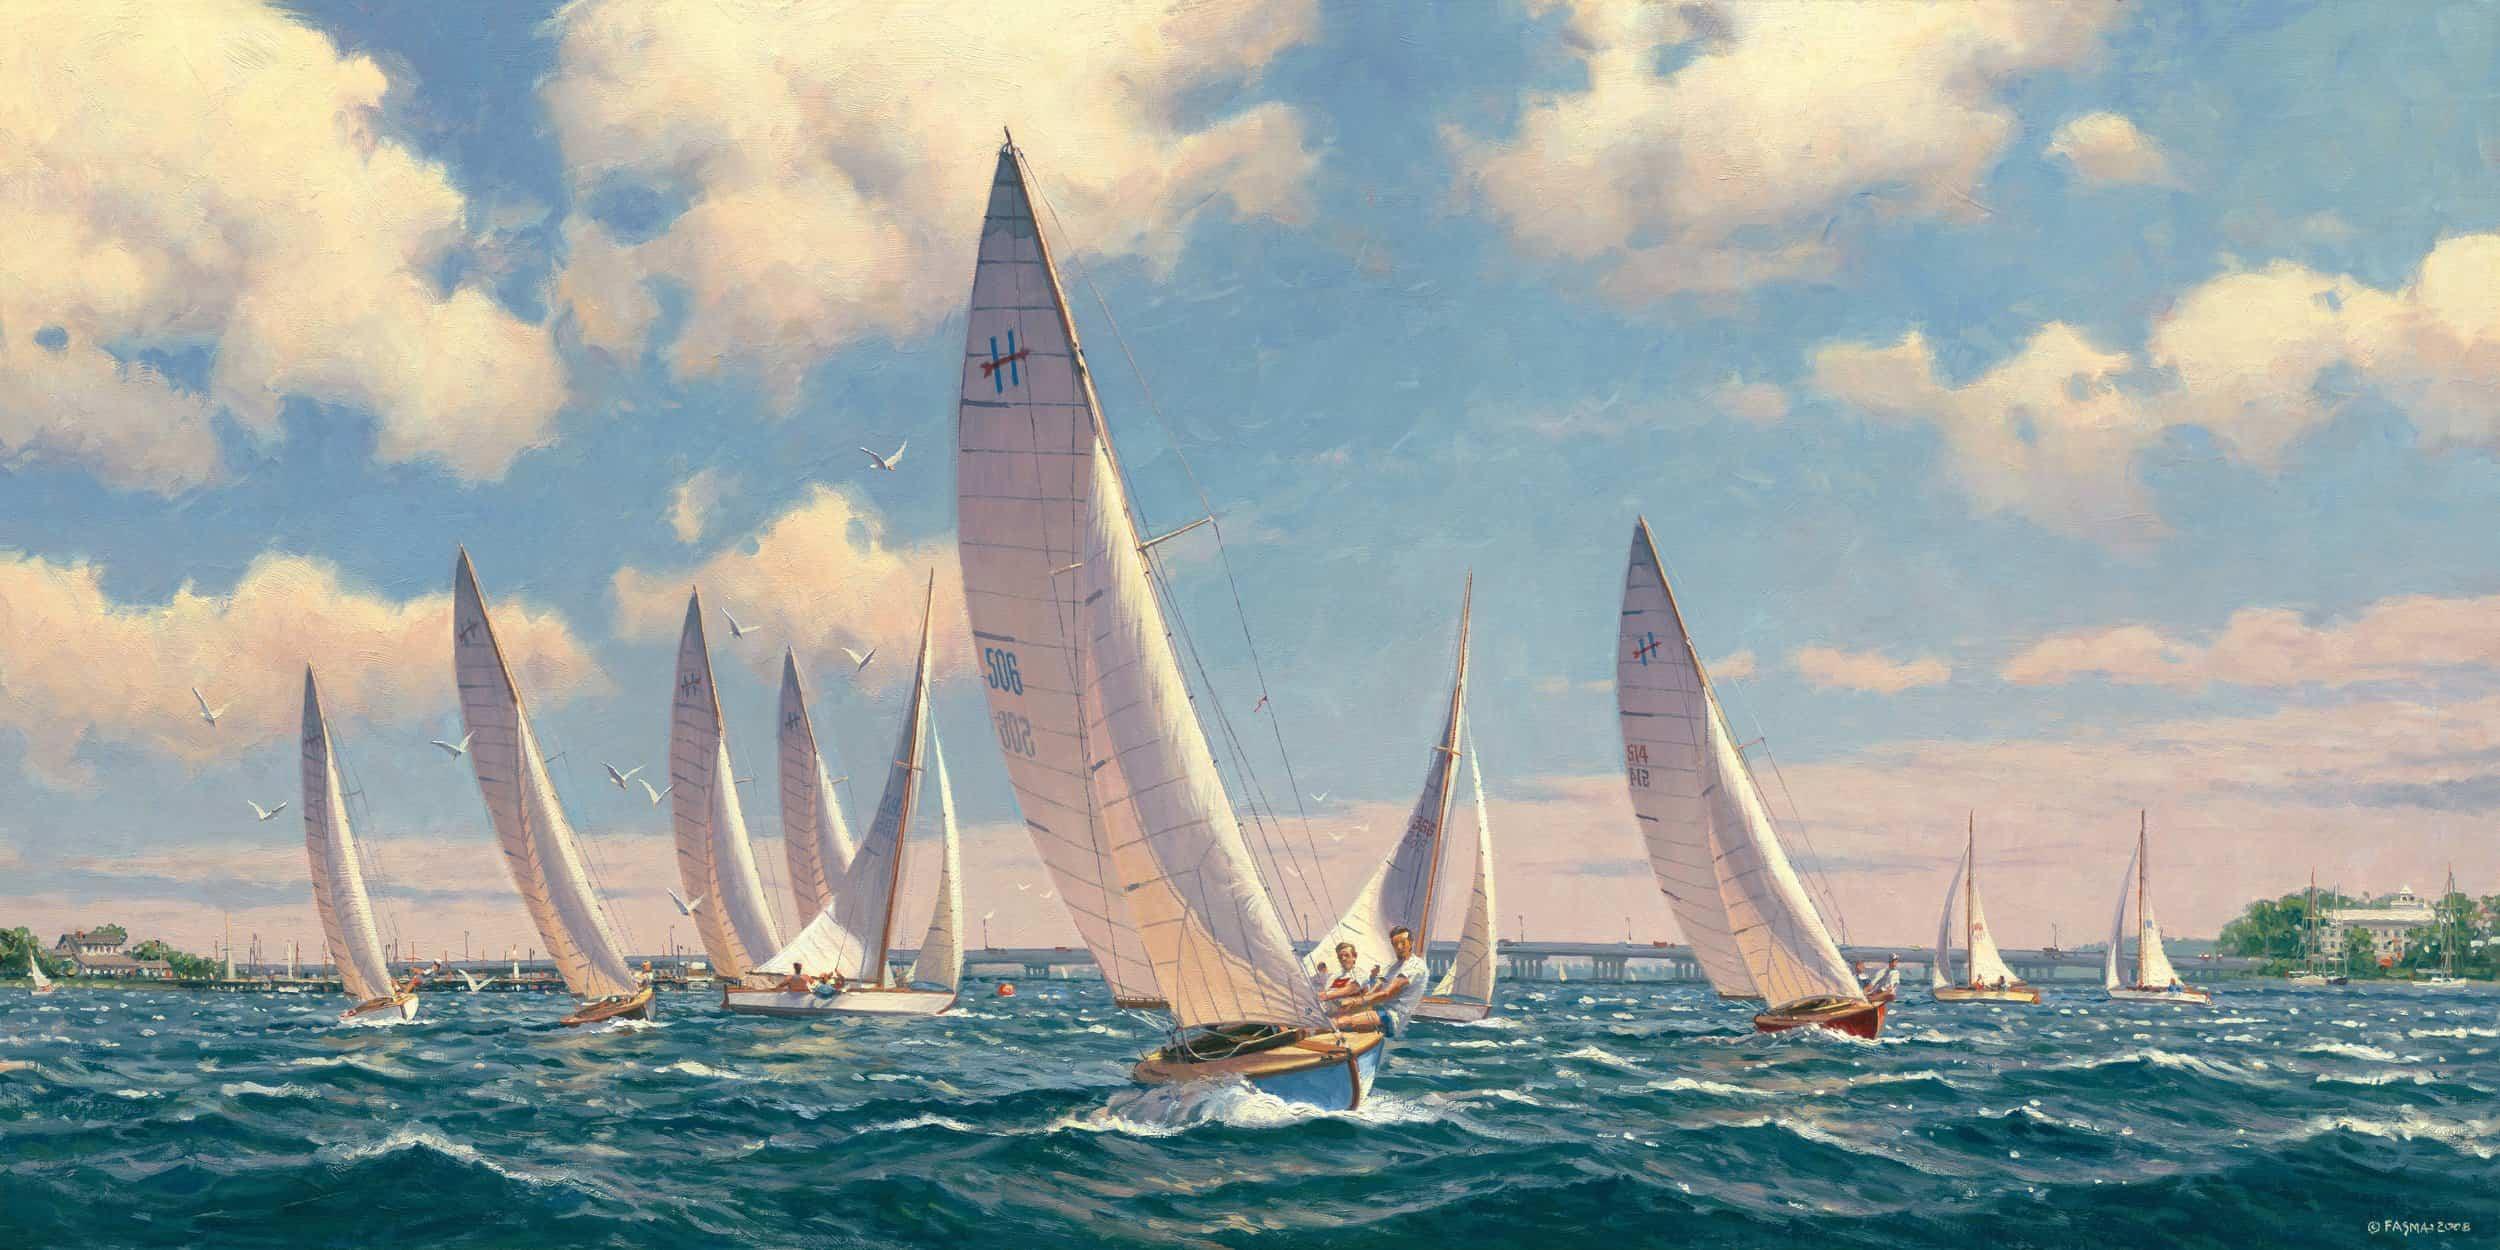 "Reaching for the Finish  Oil on Linen, 15"" x 30"". By John Barber."